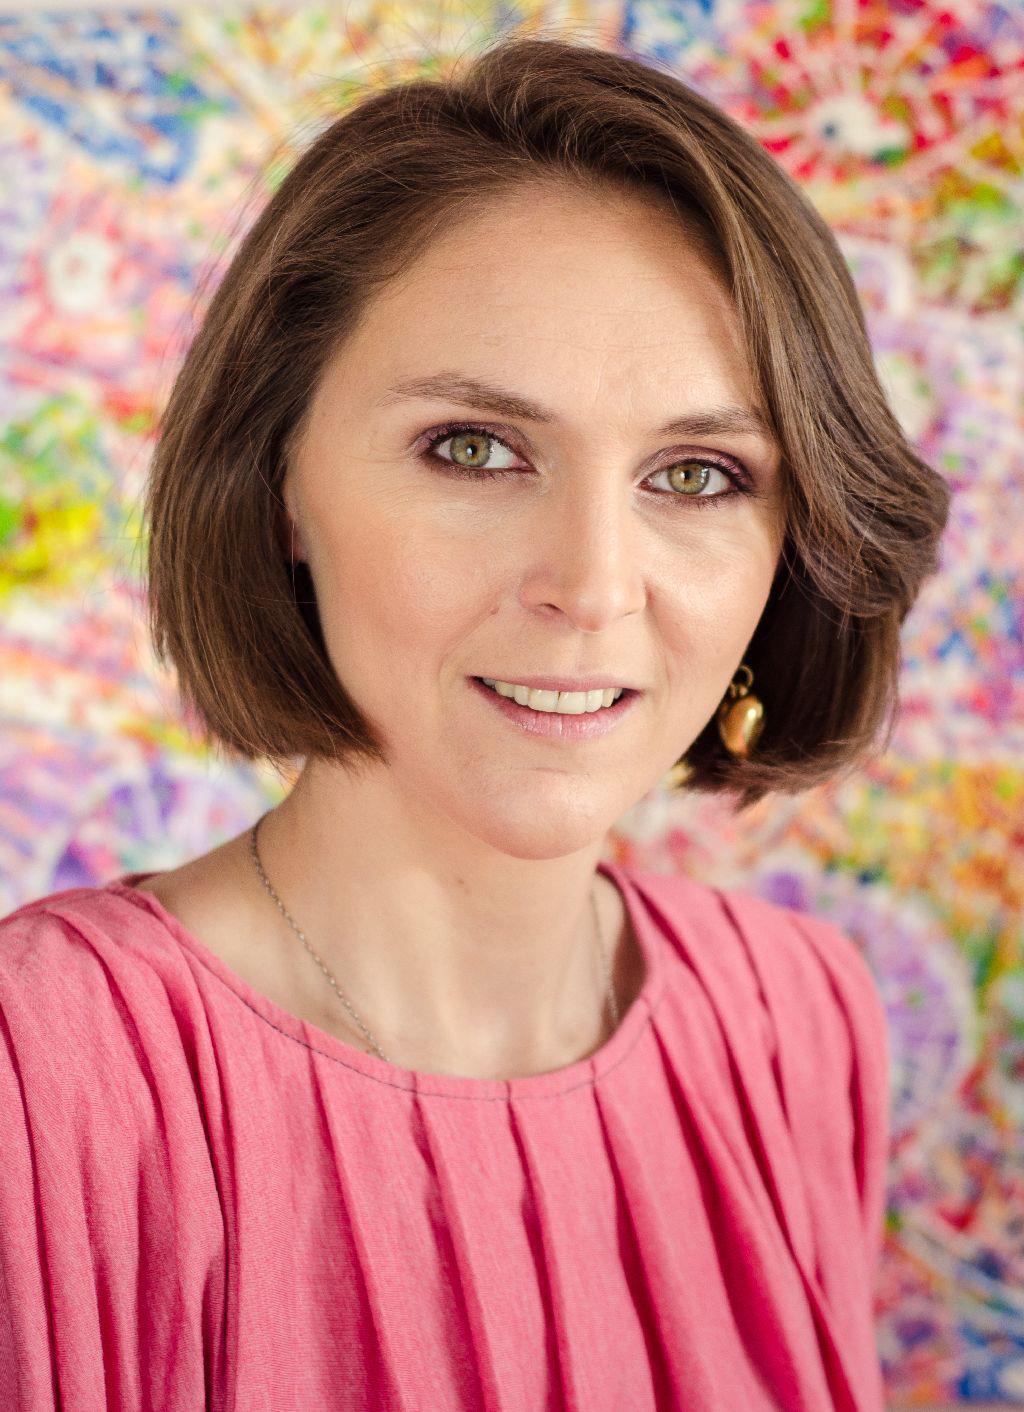 Adela Pârvu